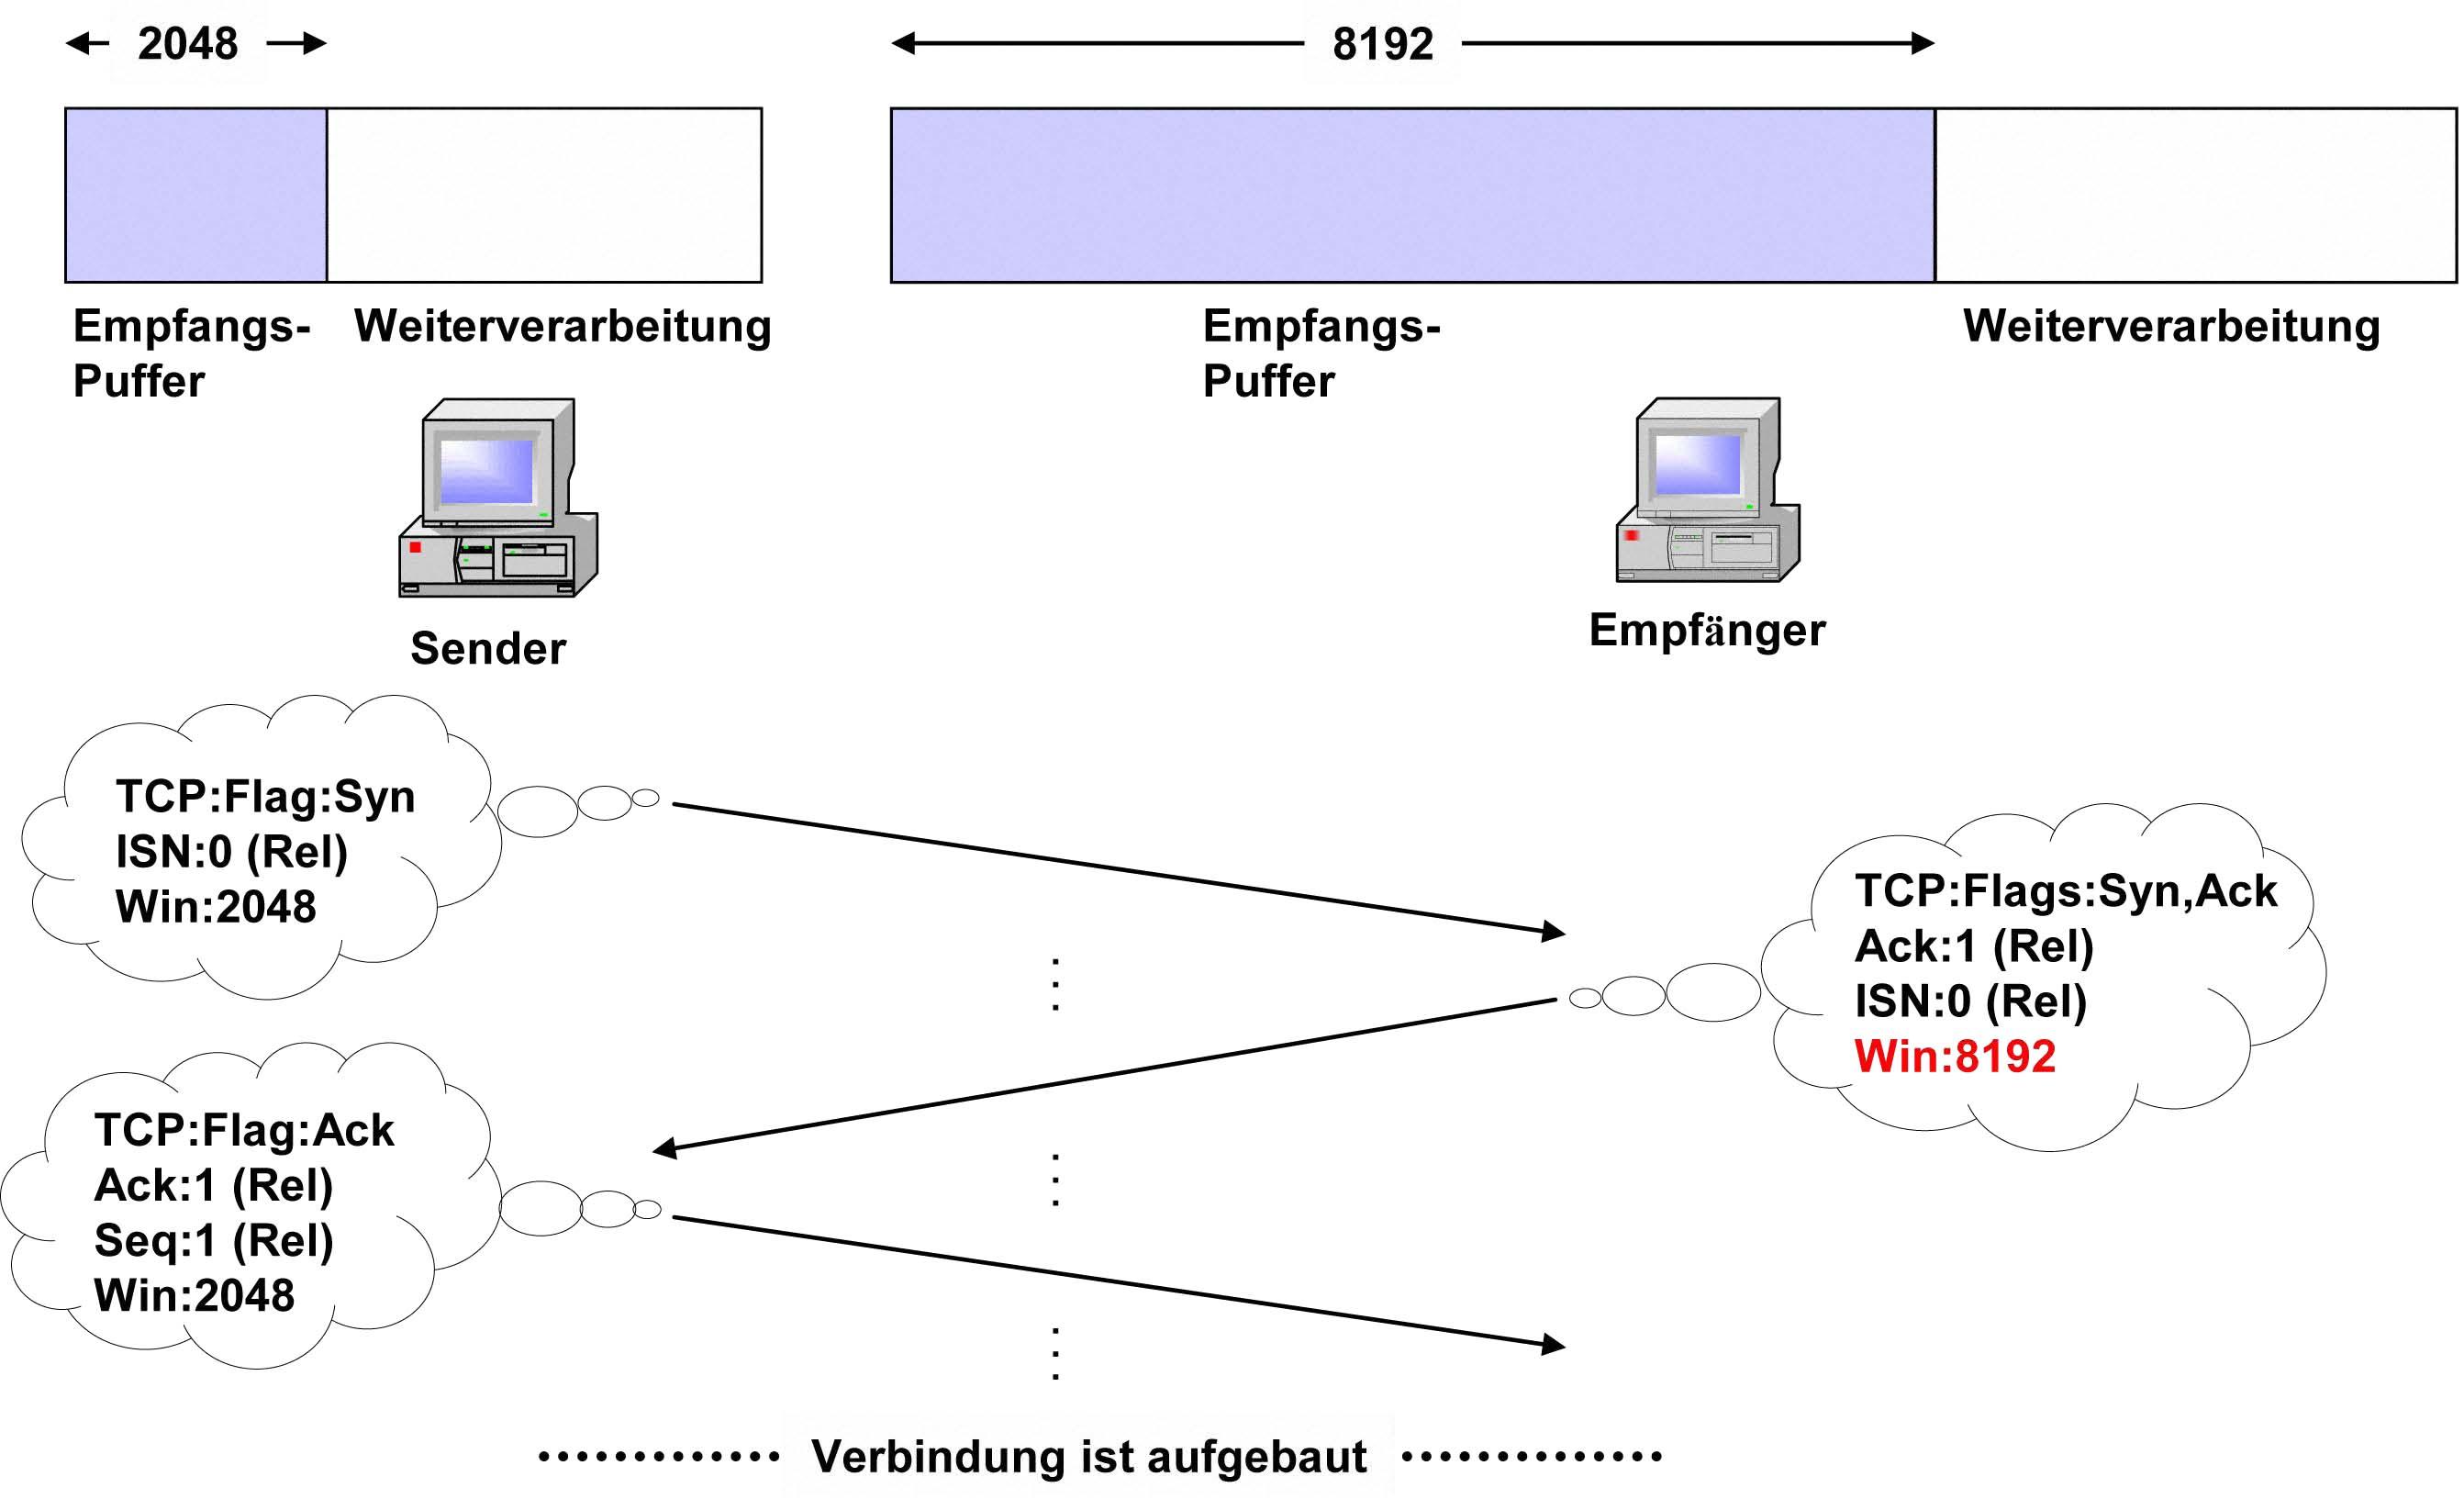 1.1.55. Verbindungsaufbau – Drei-Wege(Three-Way)-Handshake